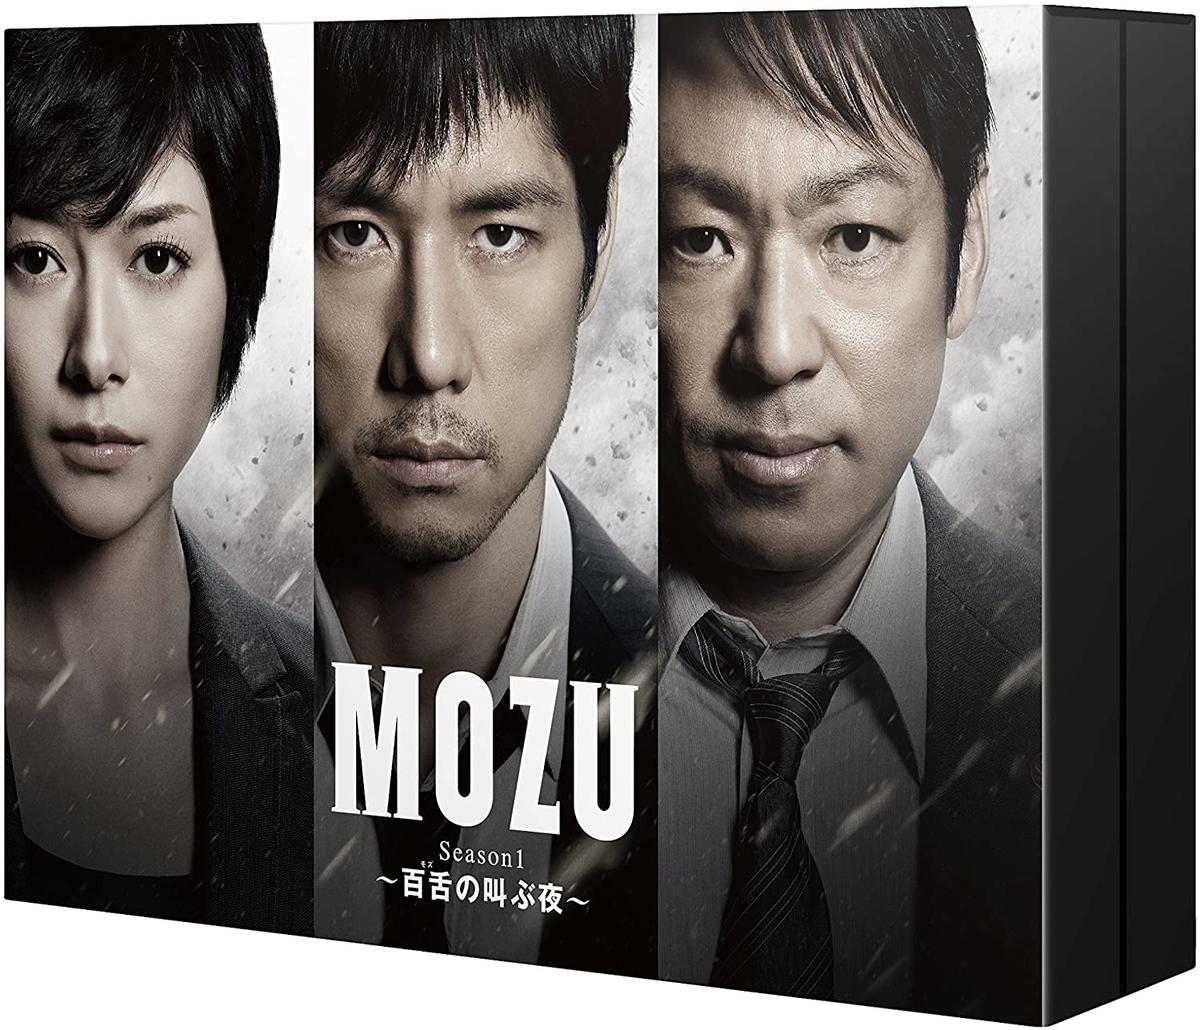 『MOZU Season1 ~百舌の叫ぶ夜~ DVD-BOX』TCエンタテインメント、2014年